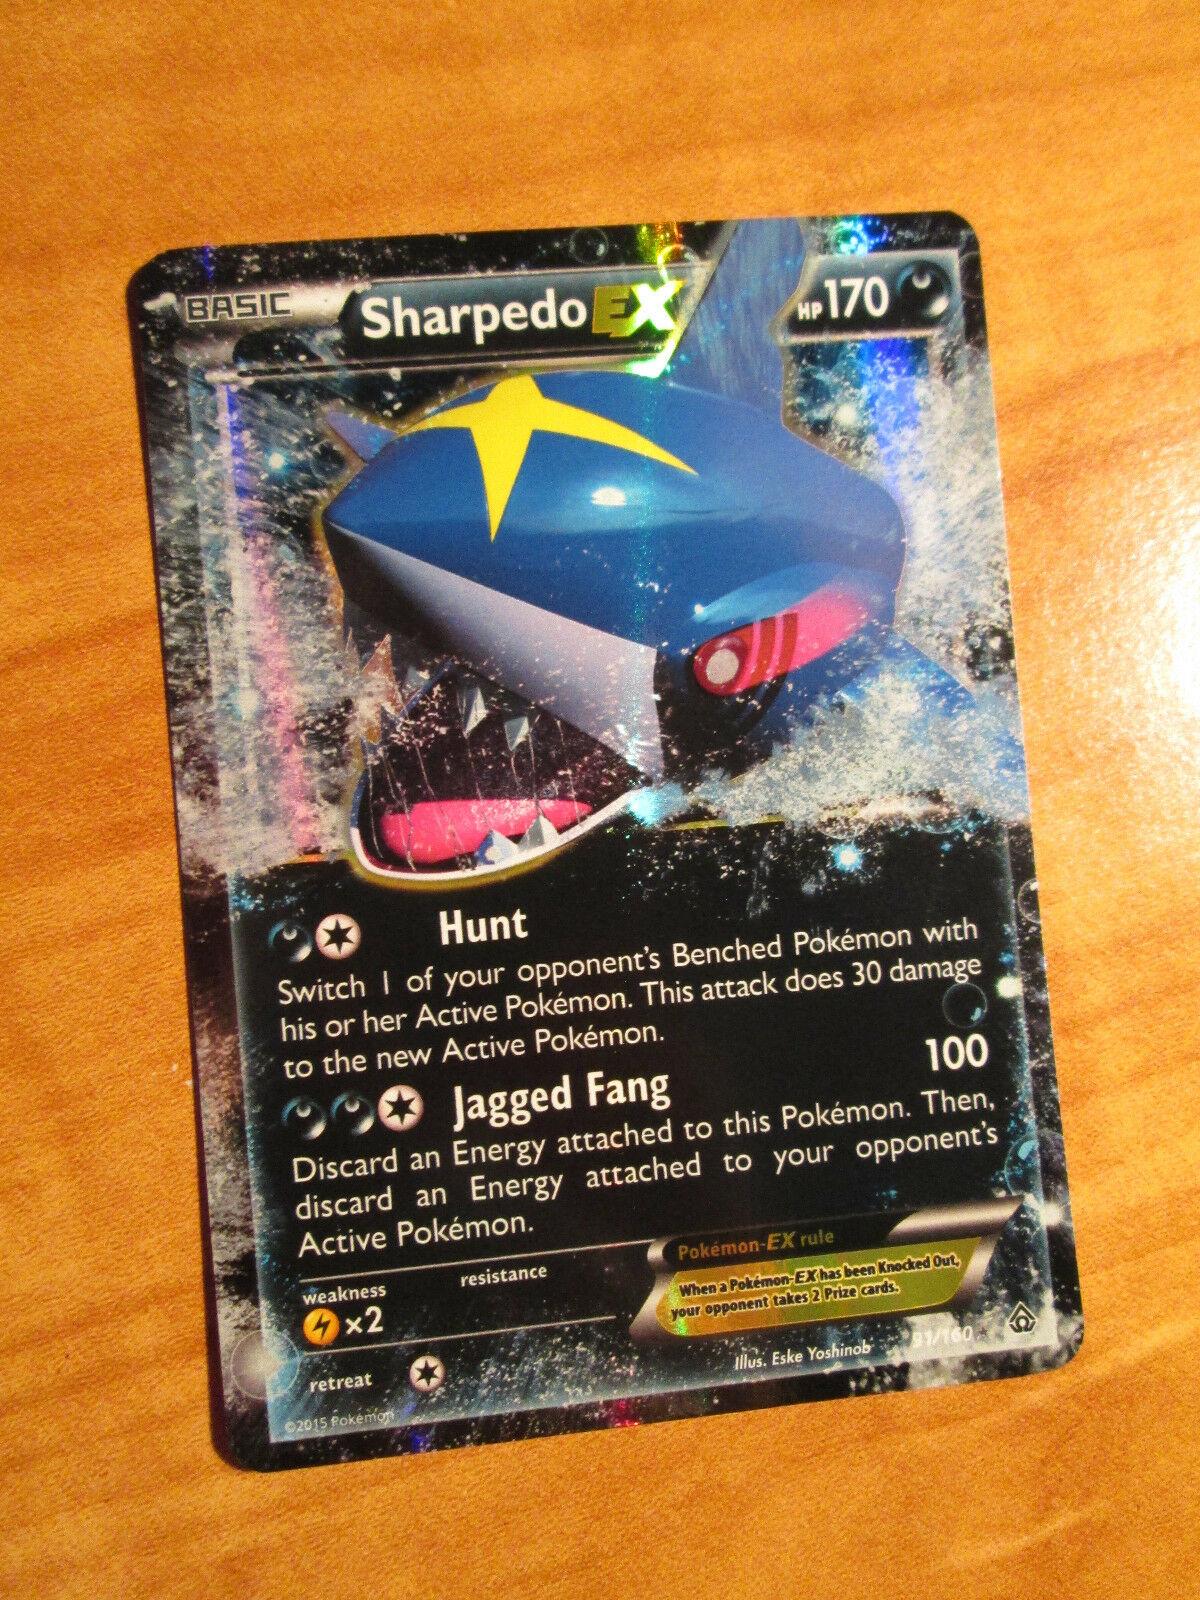 LP Pokemon SHARPEDO EX Card PRIMAL CLASH Set 91/160 XY X and Y Ultra Rare - Image 1